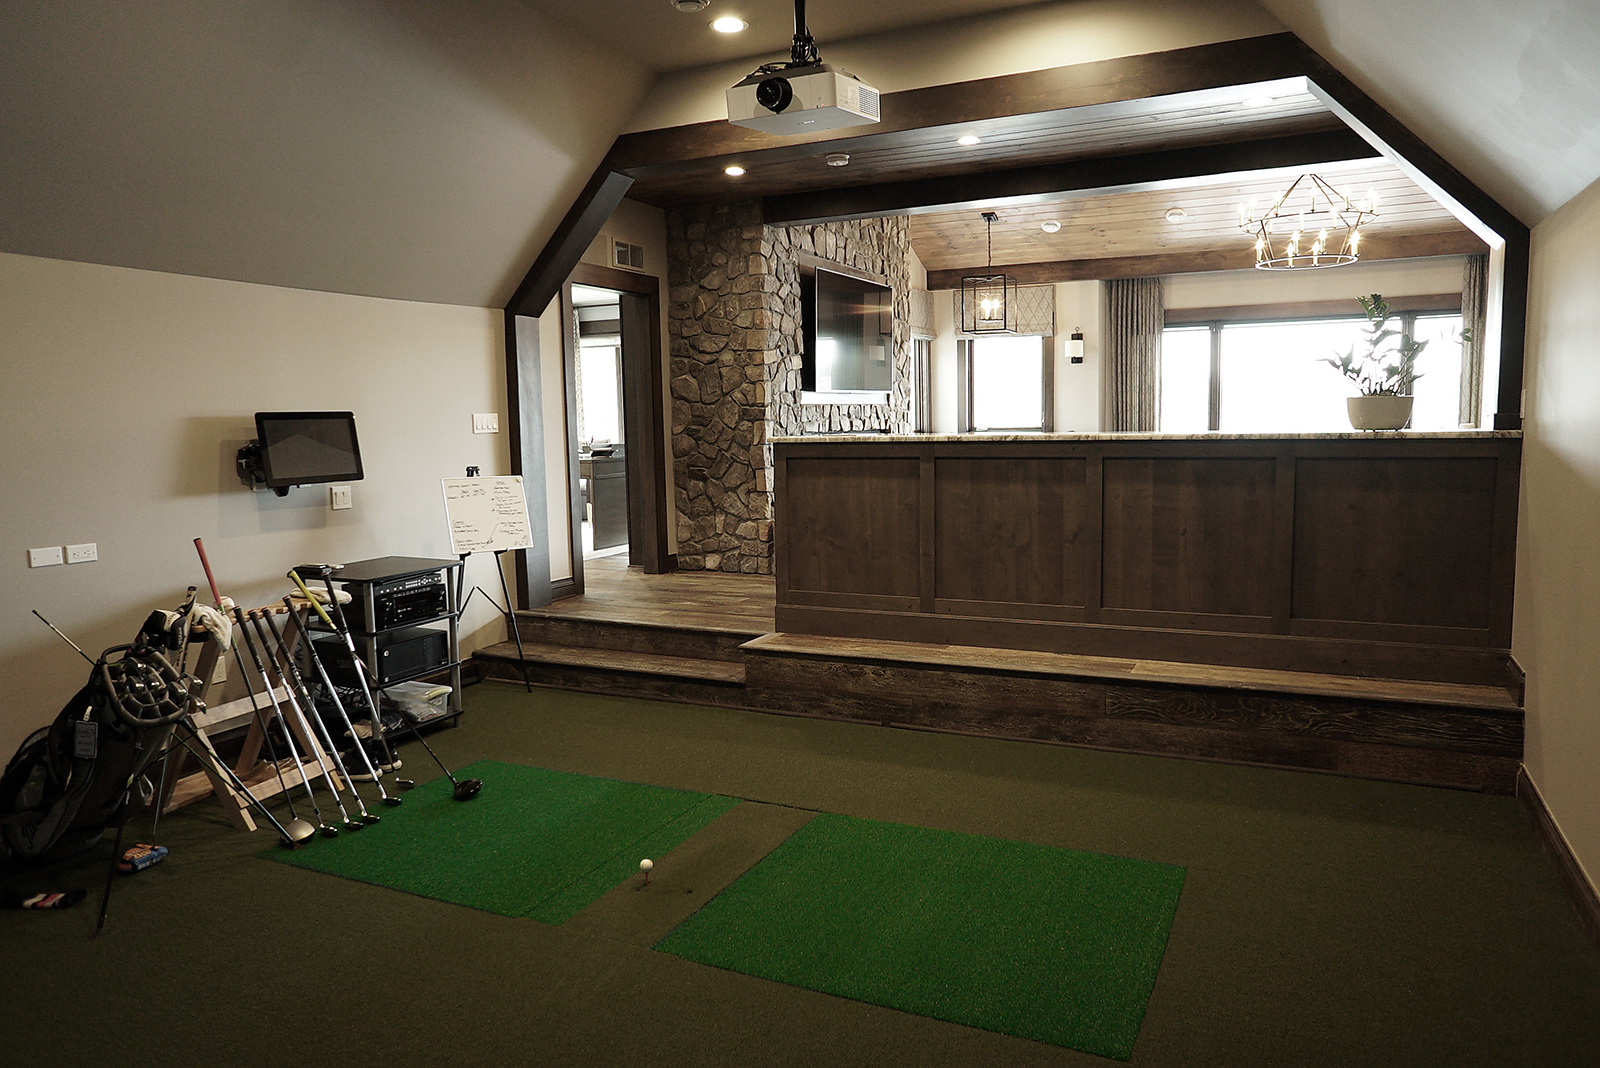 Golf_simulator_DSC06588.jpg